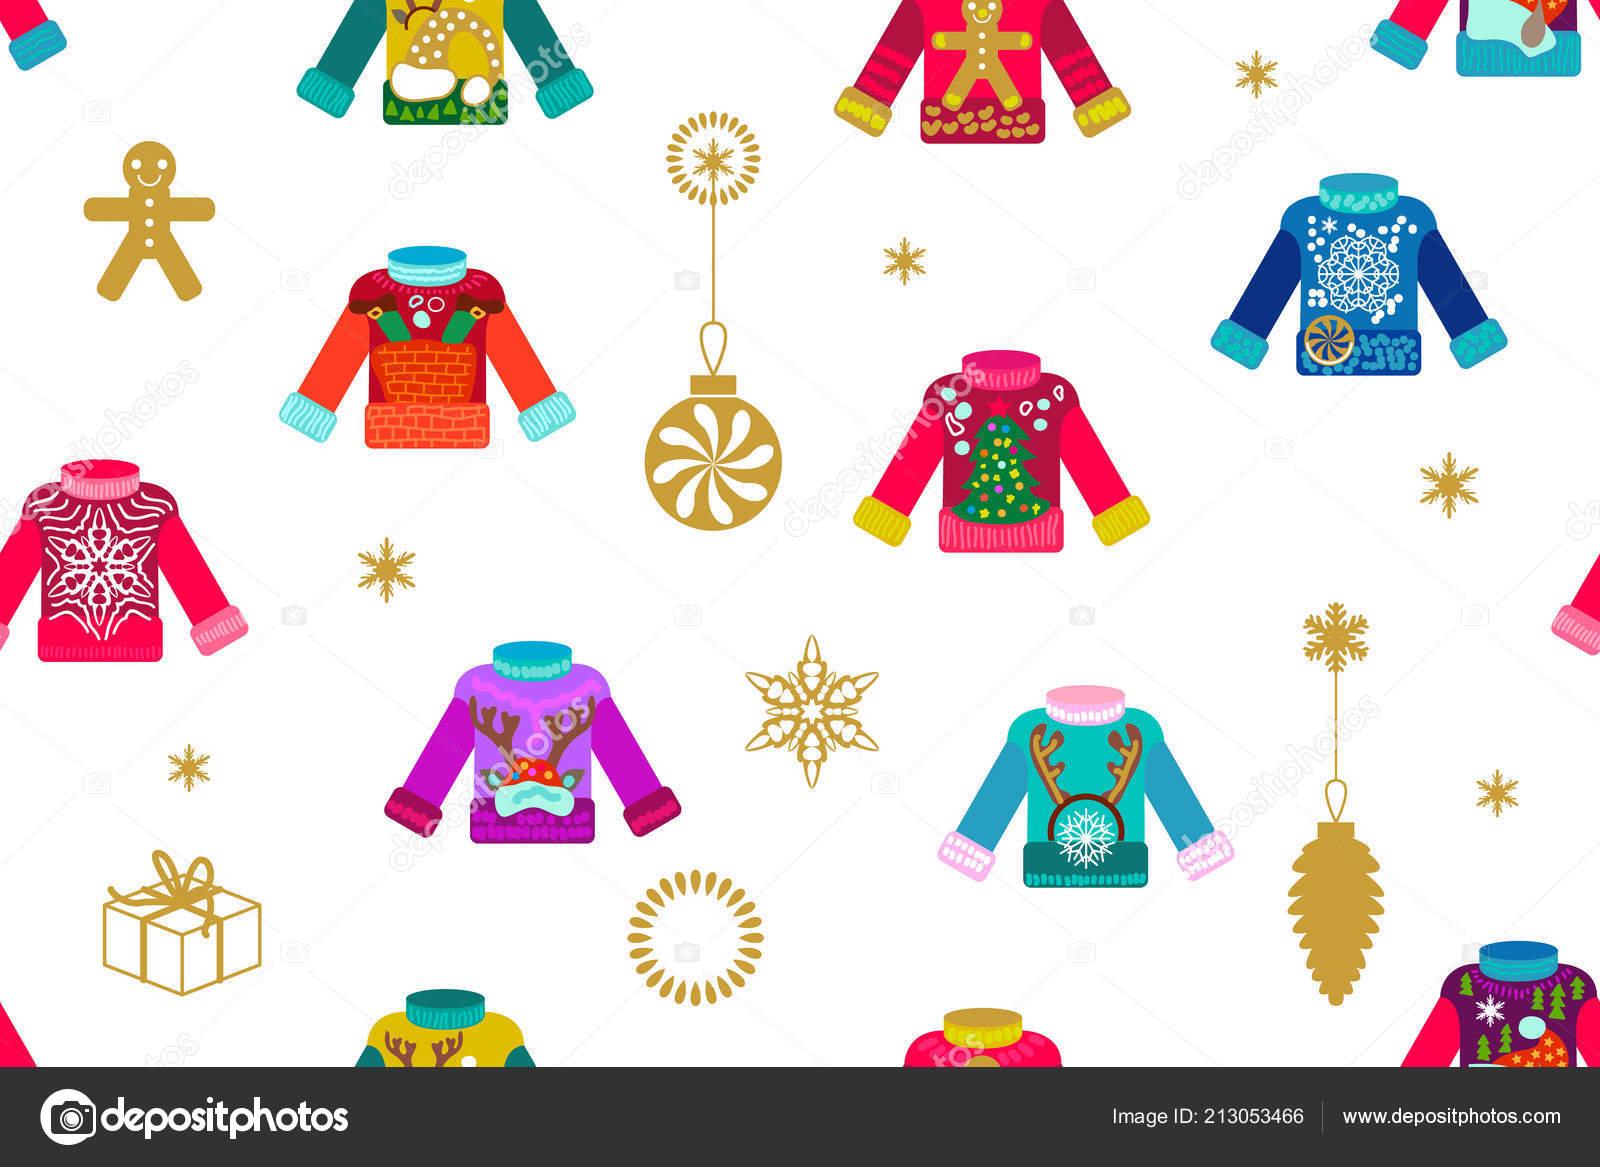 Ugly Christmas sweaters. — Stock Vector © SvetlanaKononova #213053466